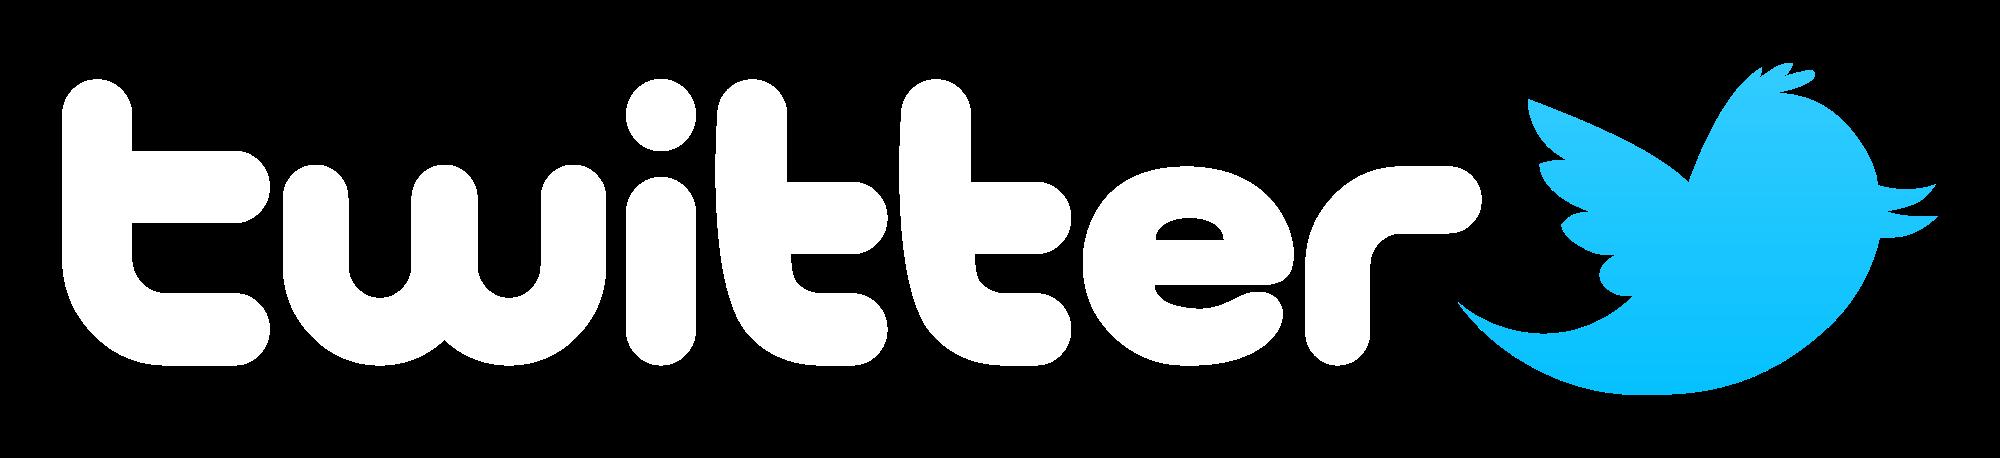 twitter logo png HD Wallpapers Download Free twitter logo ...